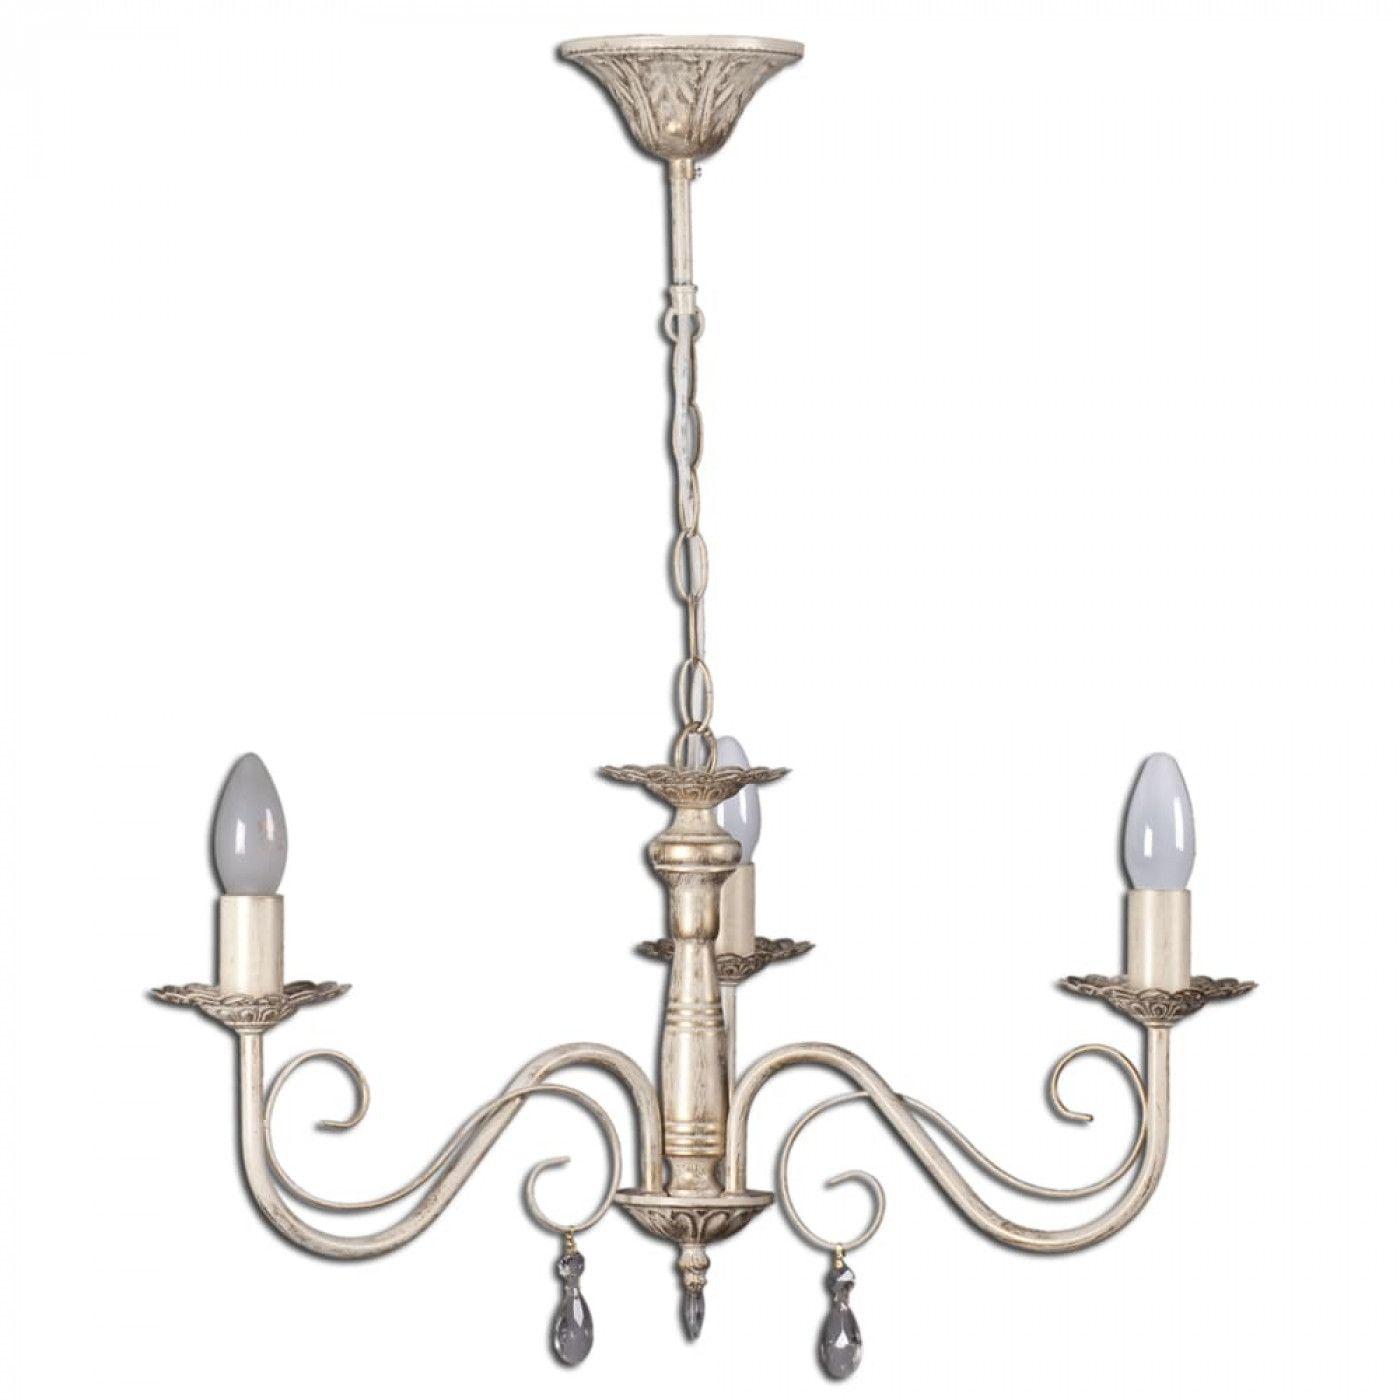 PETRASVET / Pendant chandelier S1019-3, 3xE14 max. 60W